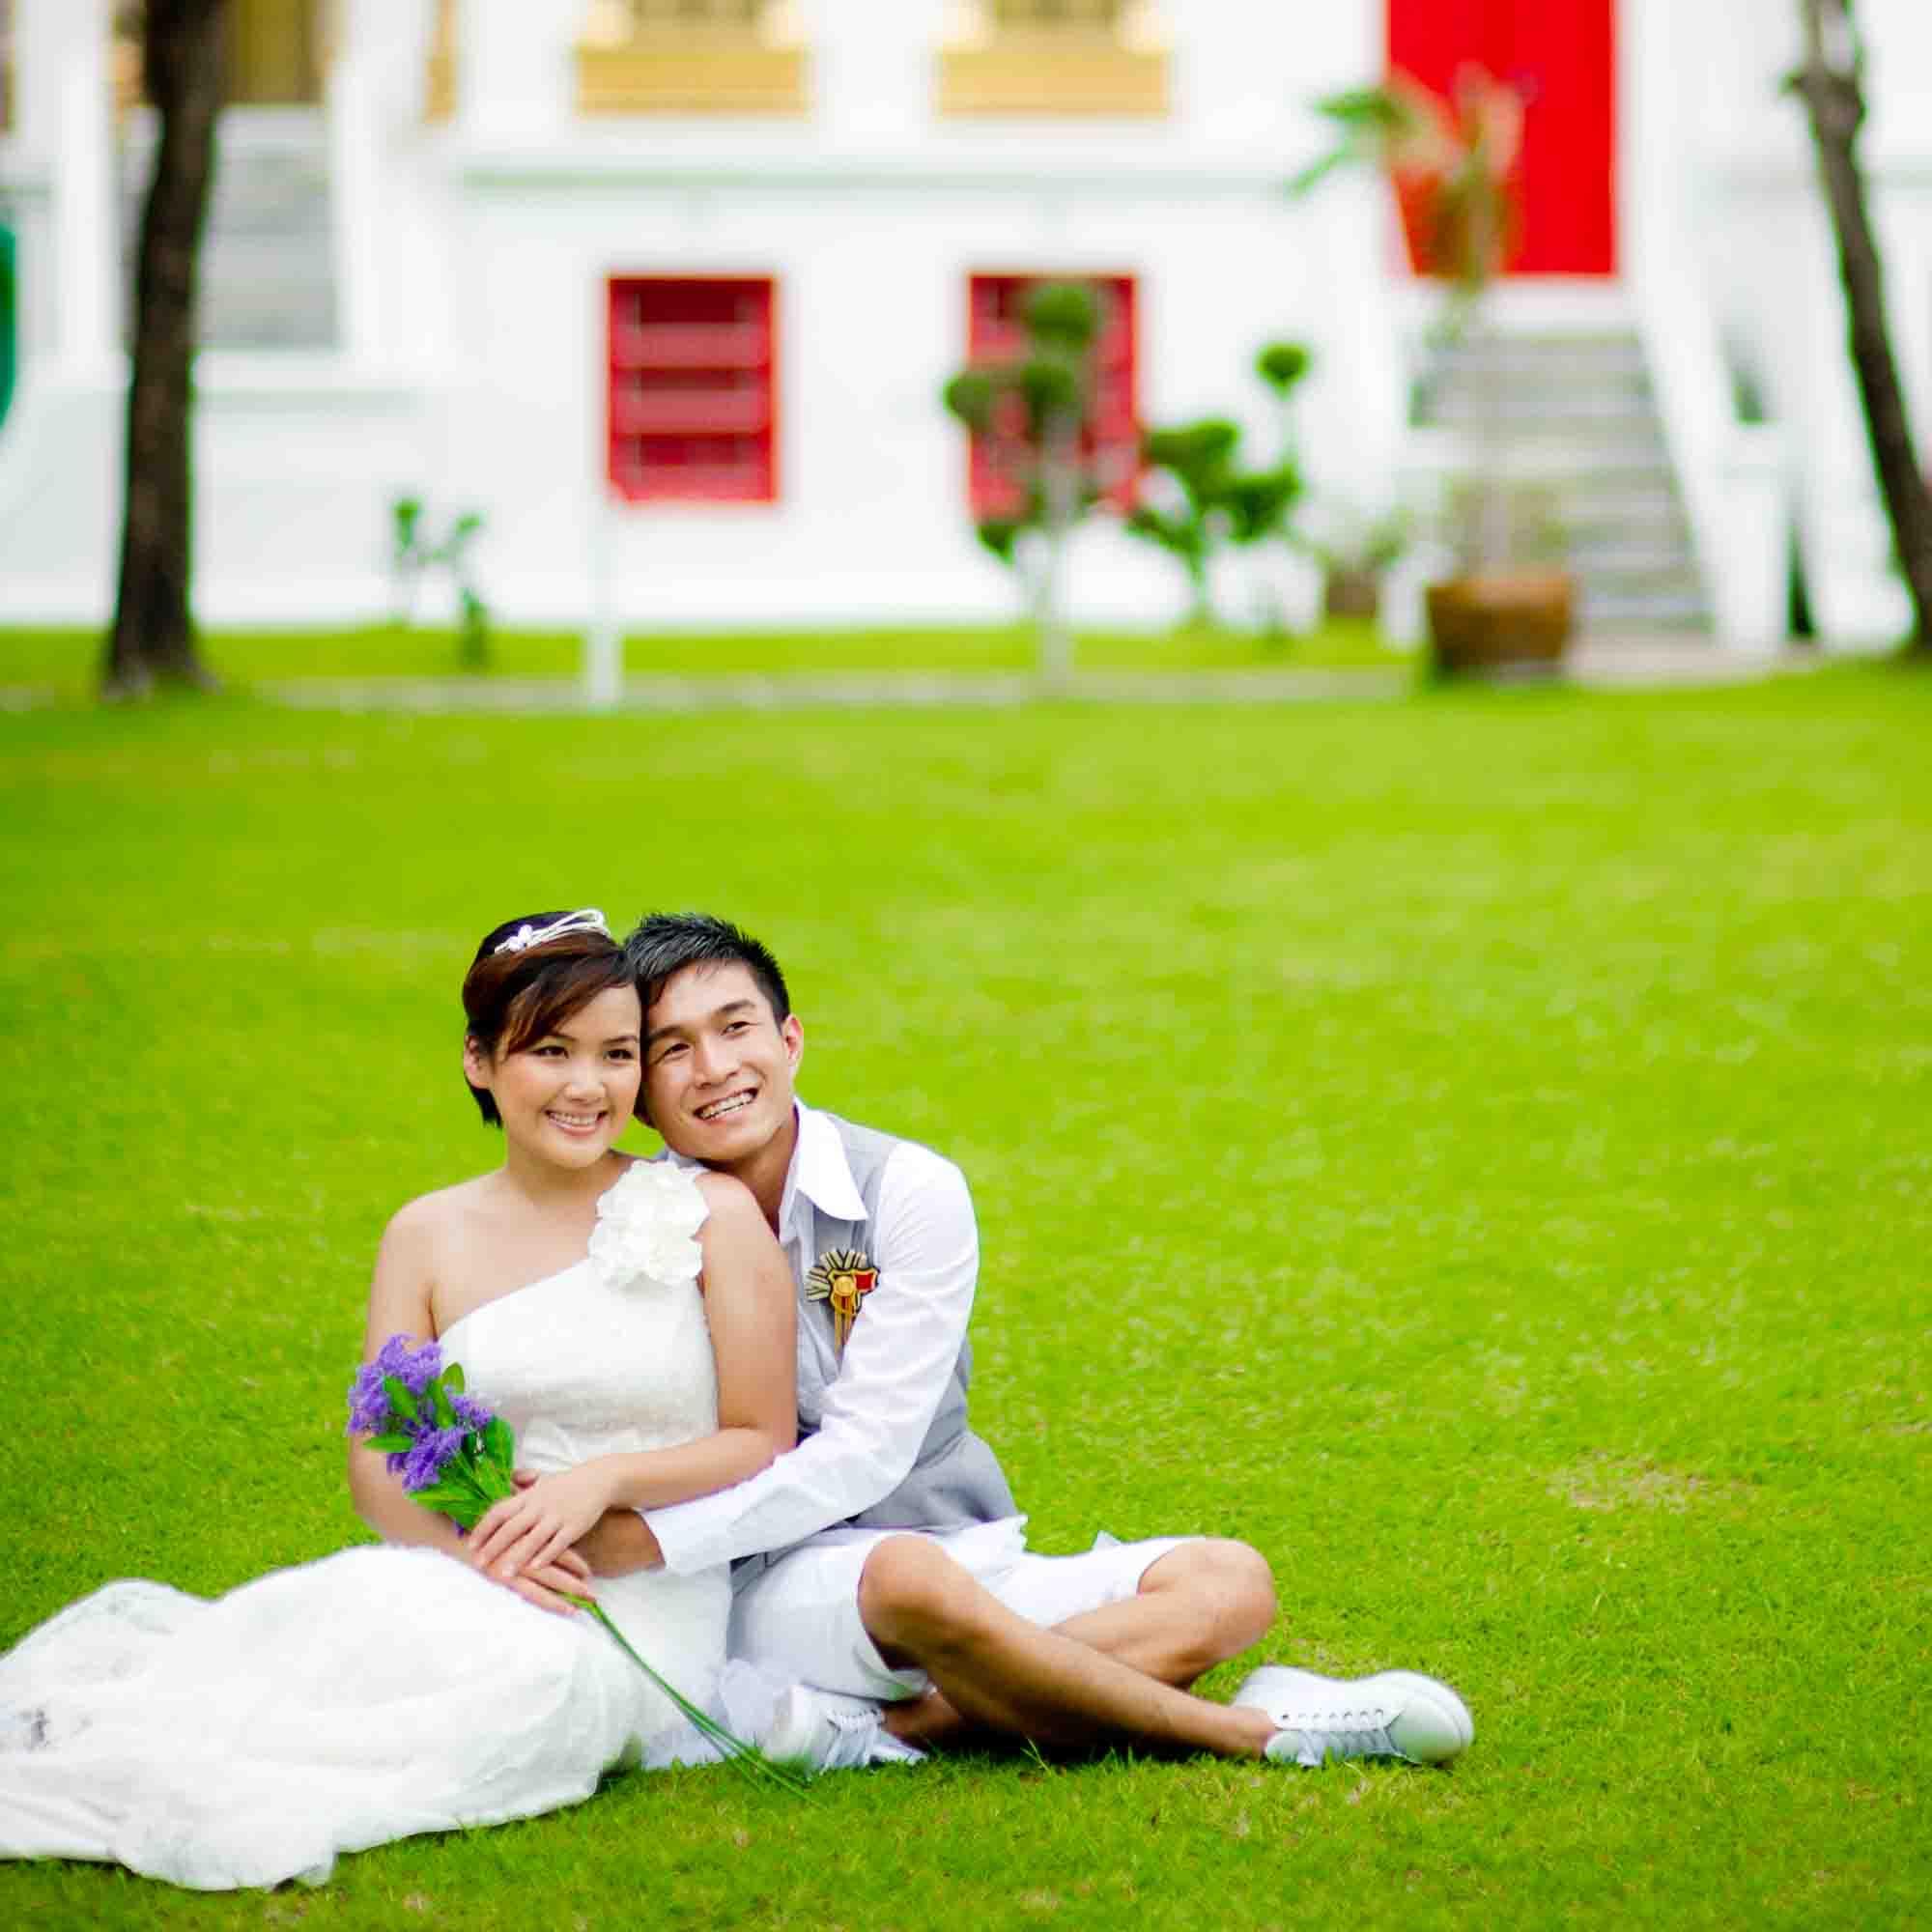 Marble Temple Pre-Wedding - 18 June 2012